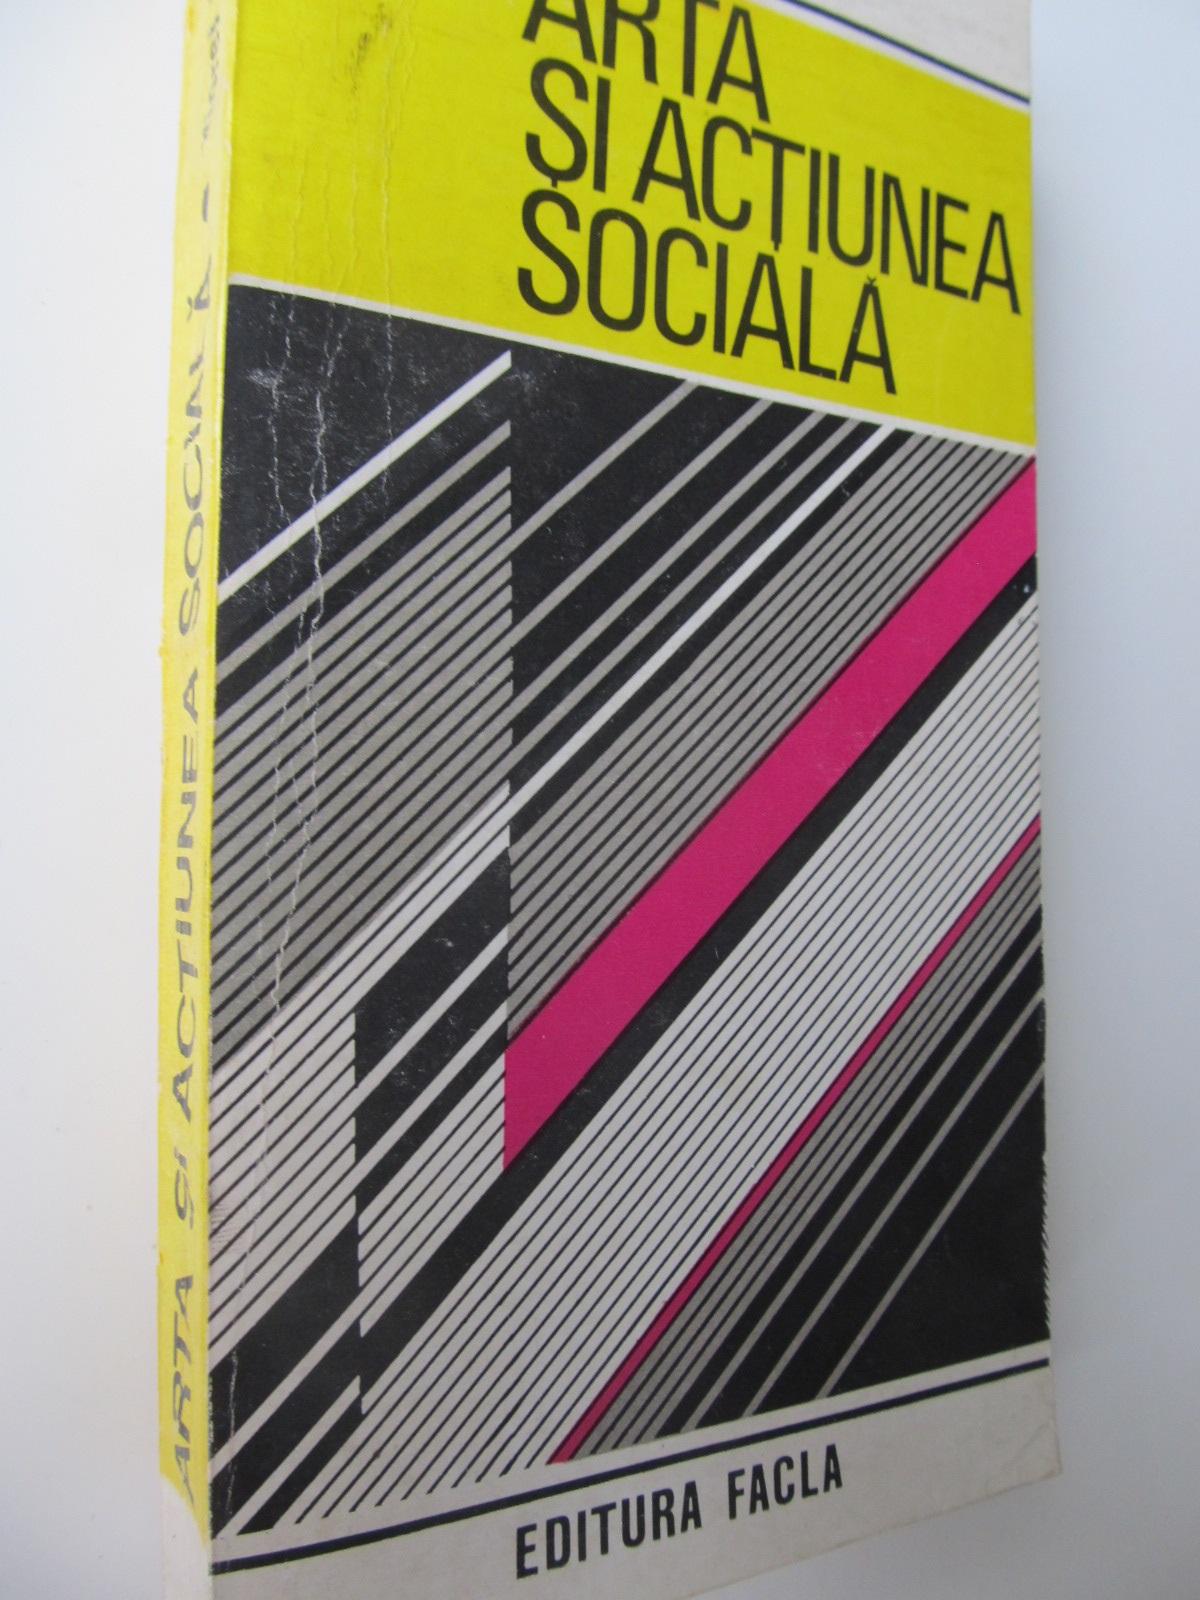 Arta si actiunea sociala - Viorel Sarbu | Detalii carte